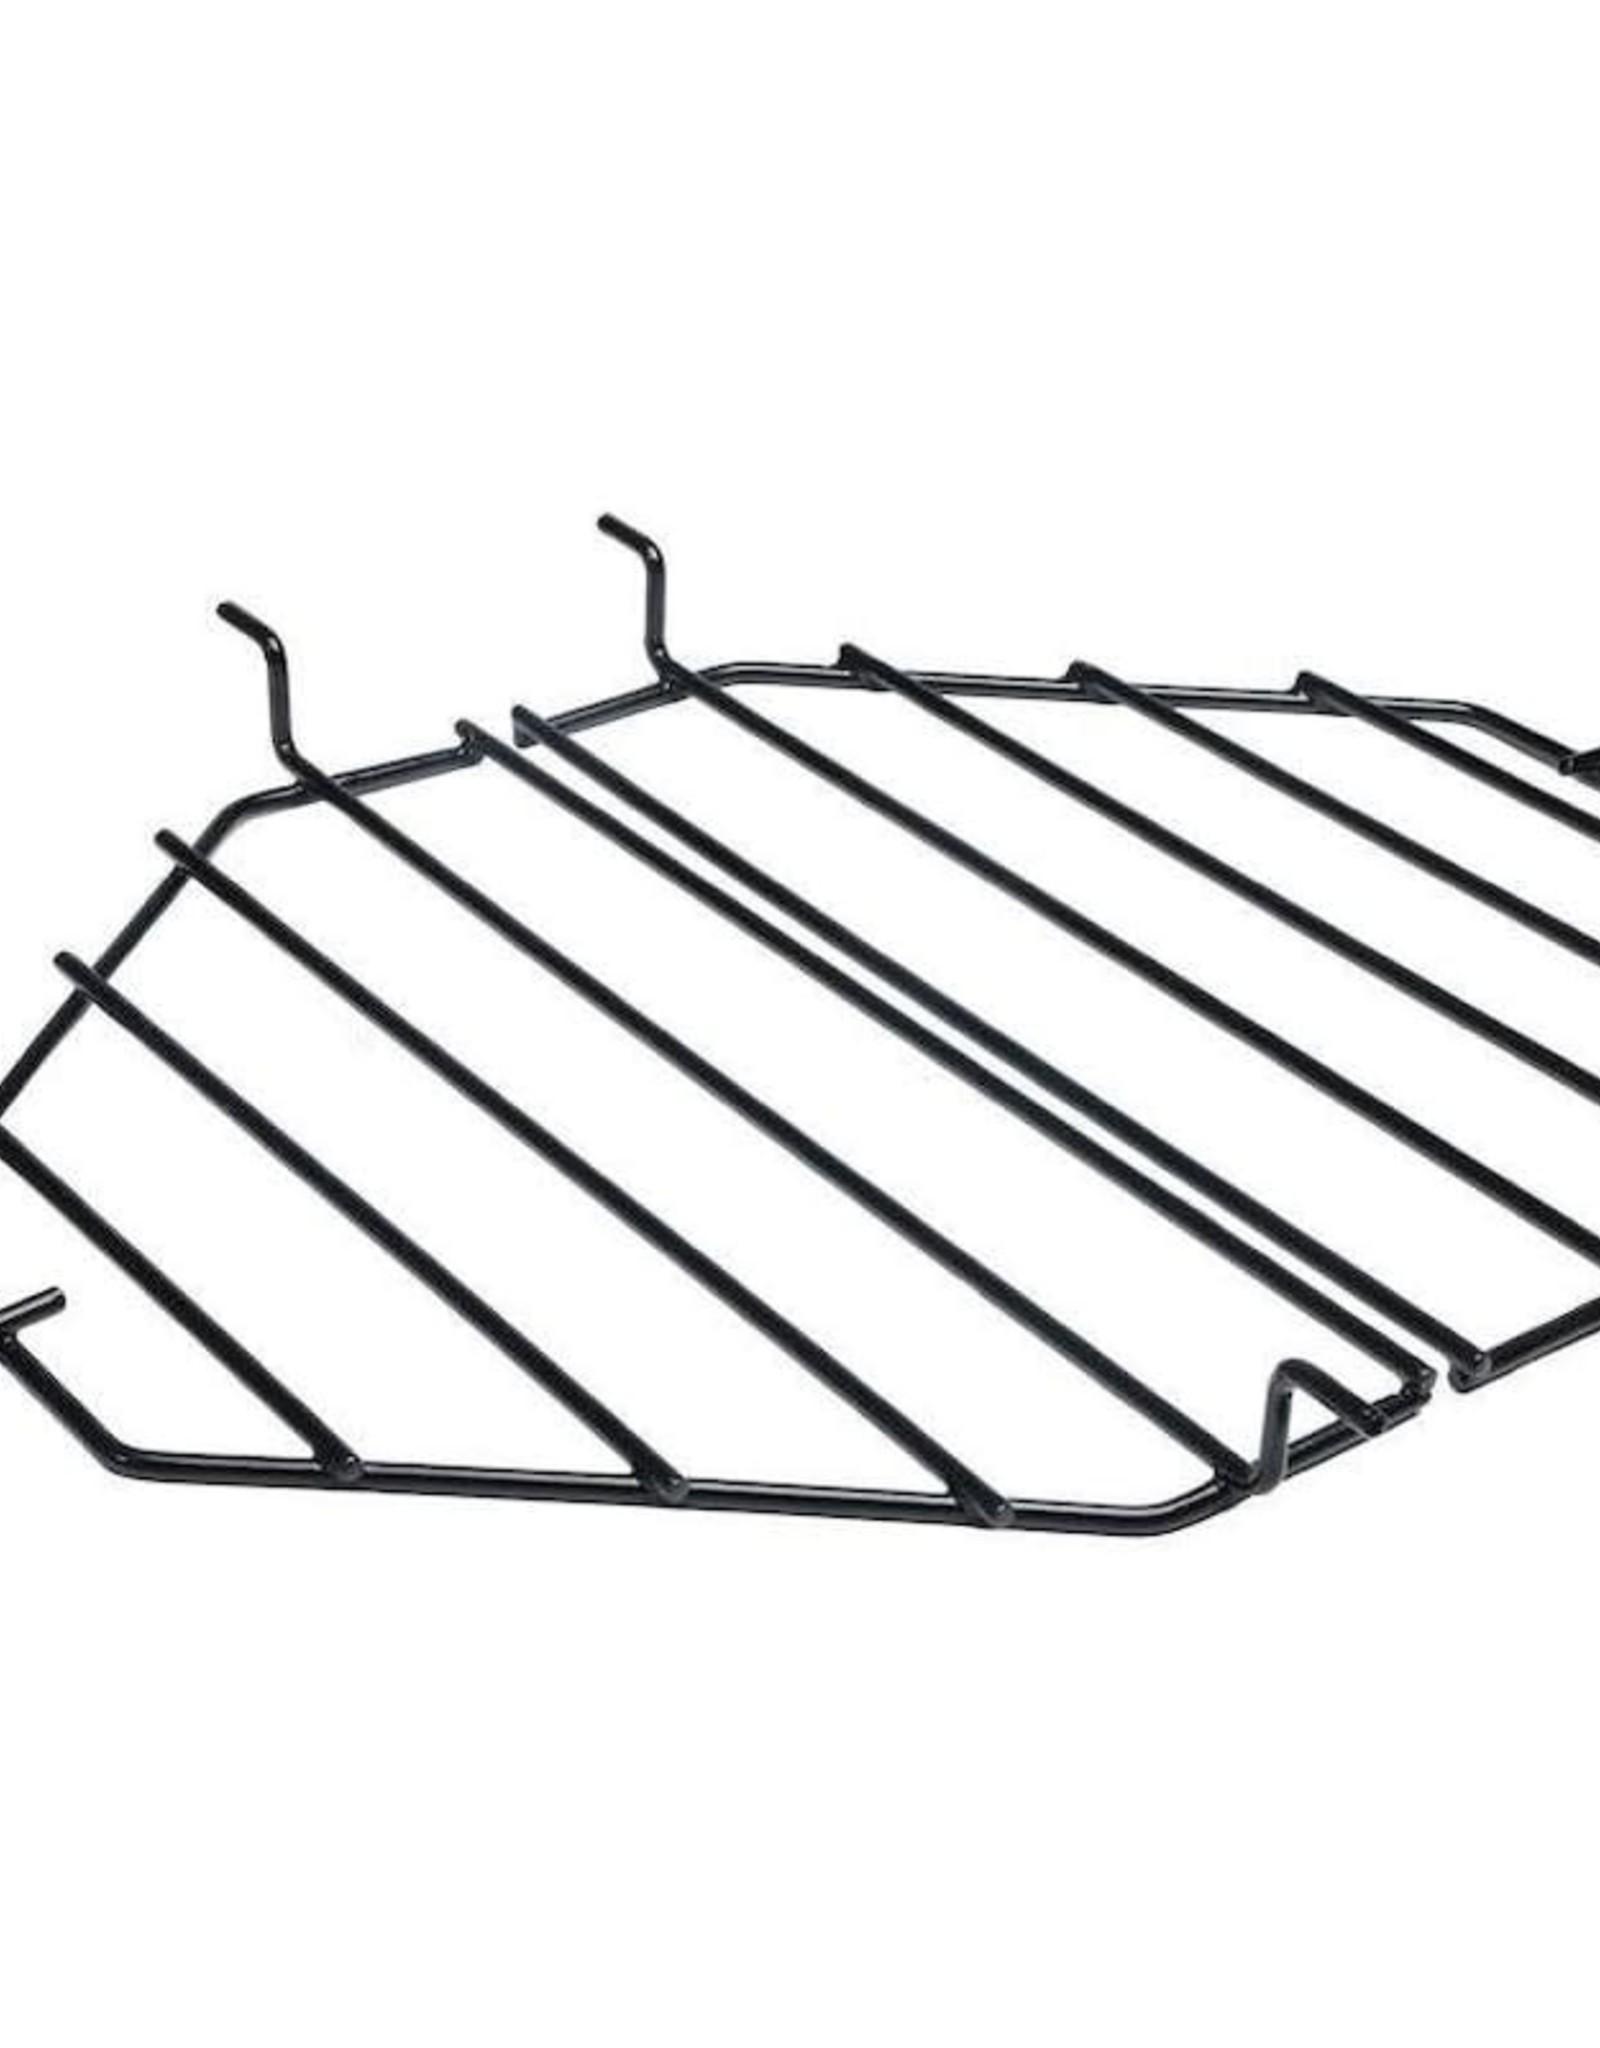 Primo Heat Deflector Racks For Oval Large 300 - 316